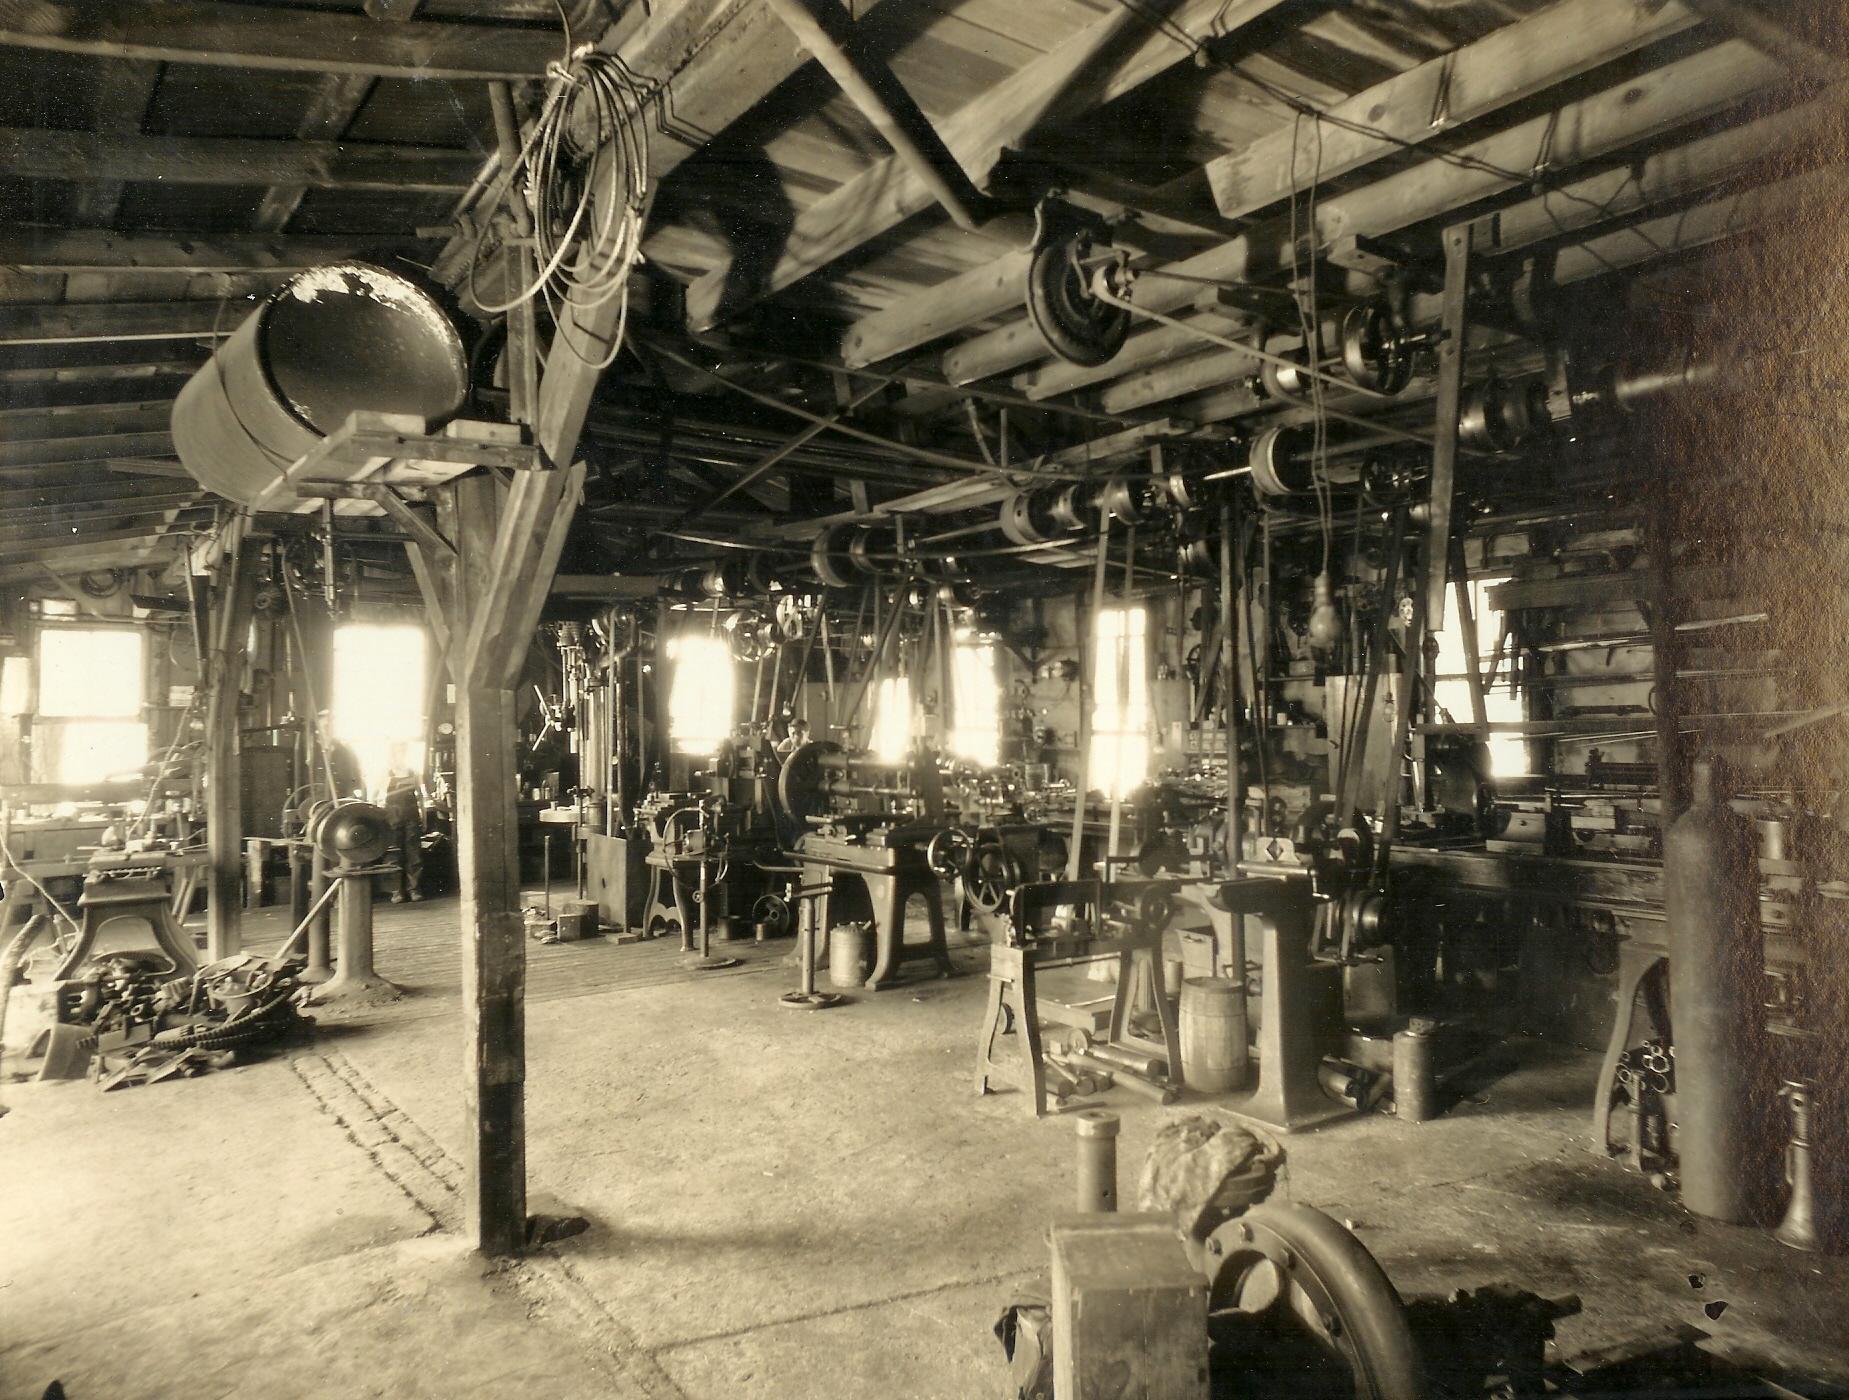 johns machine shop